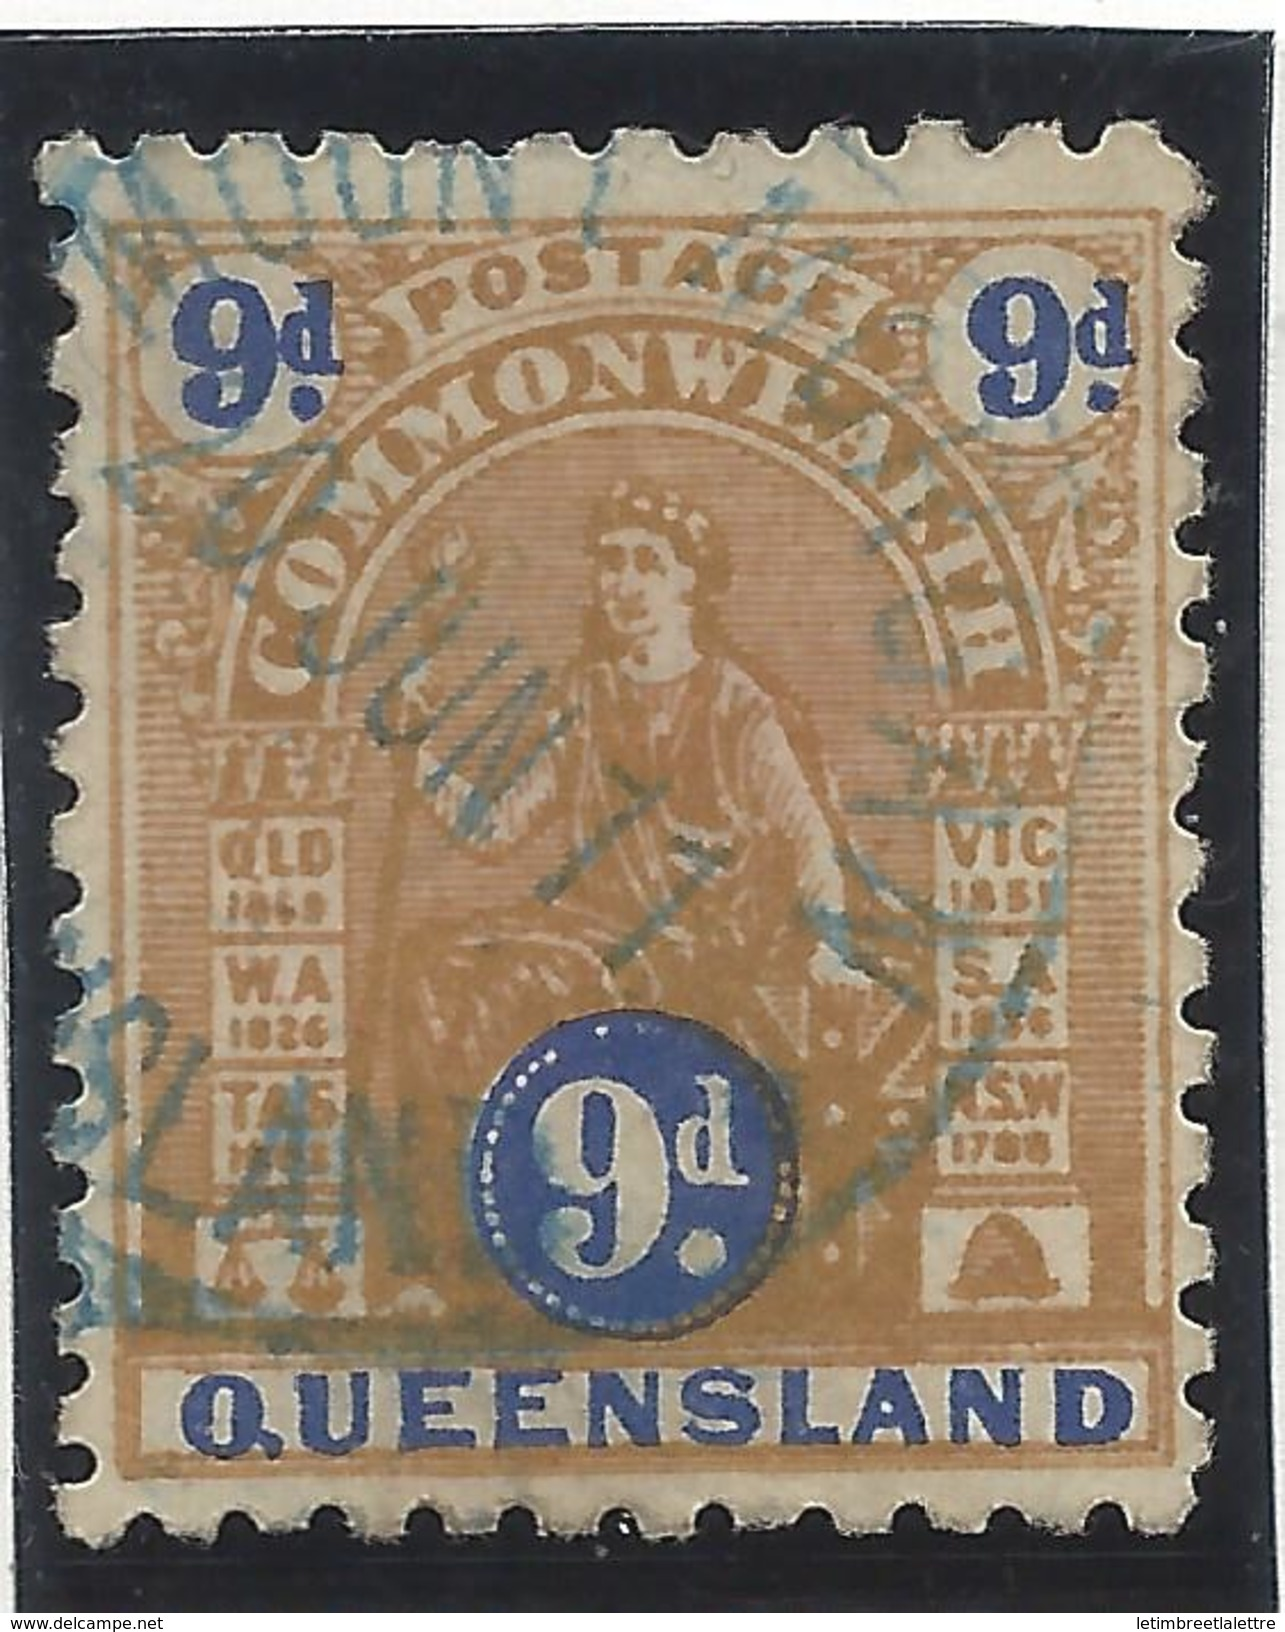 Queensland - N° 101a - Oblitéré - Dentelé 11 - RARE - 1860-1909 Queensland